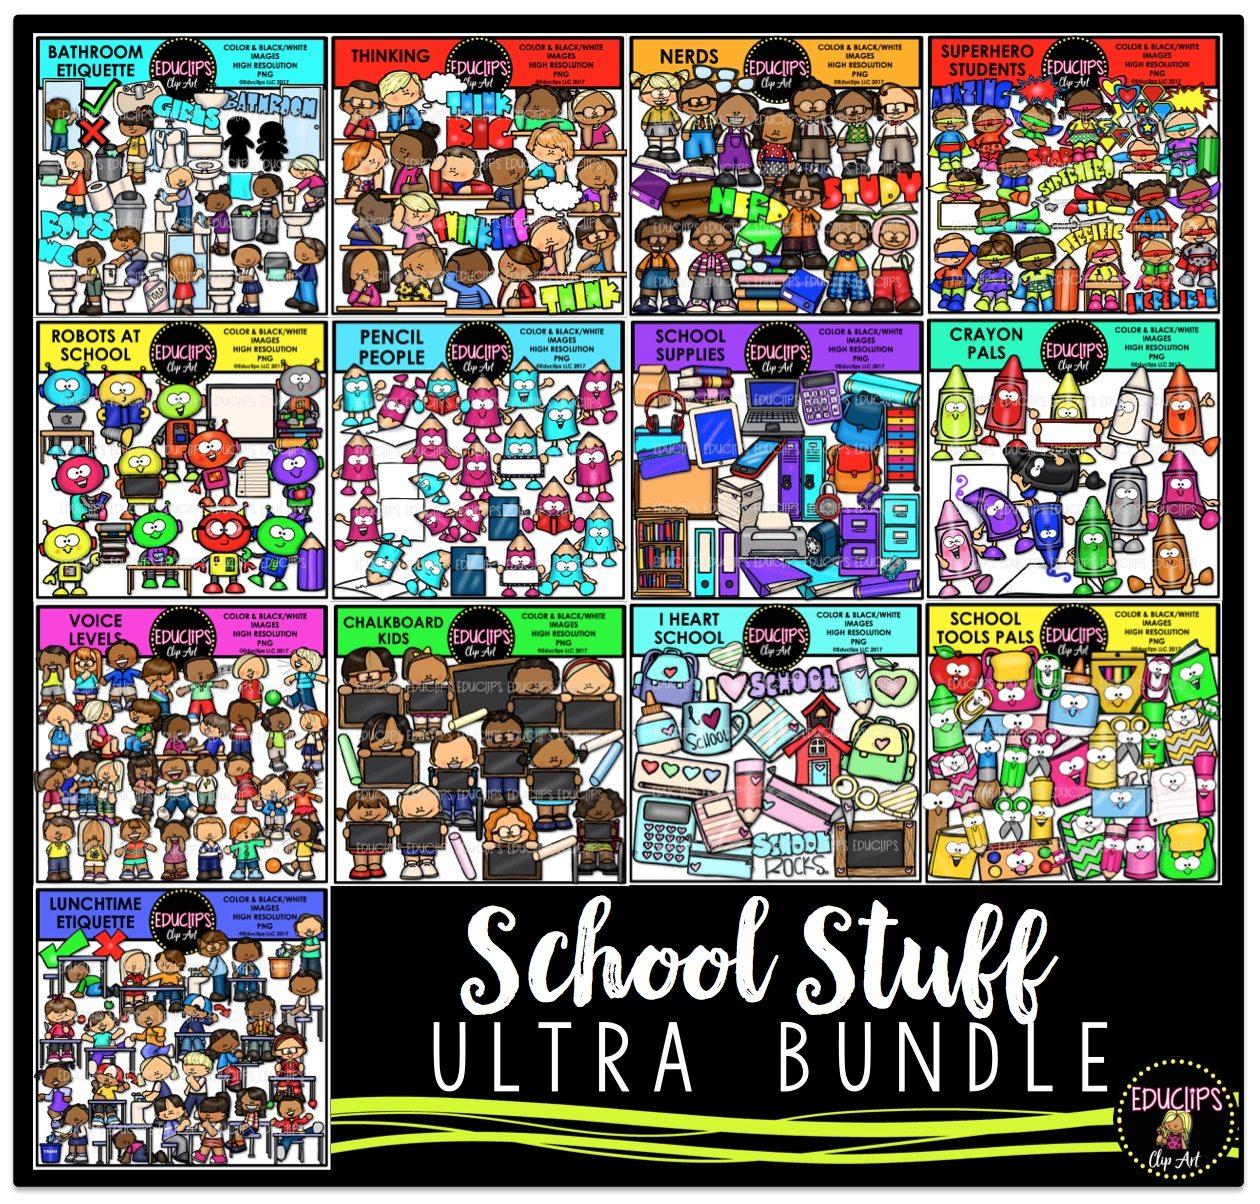 School Stuff Clip Art Ultra Bundle (Color and B&W)